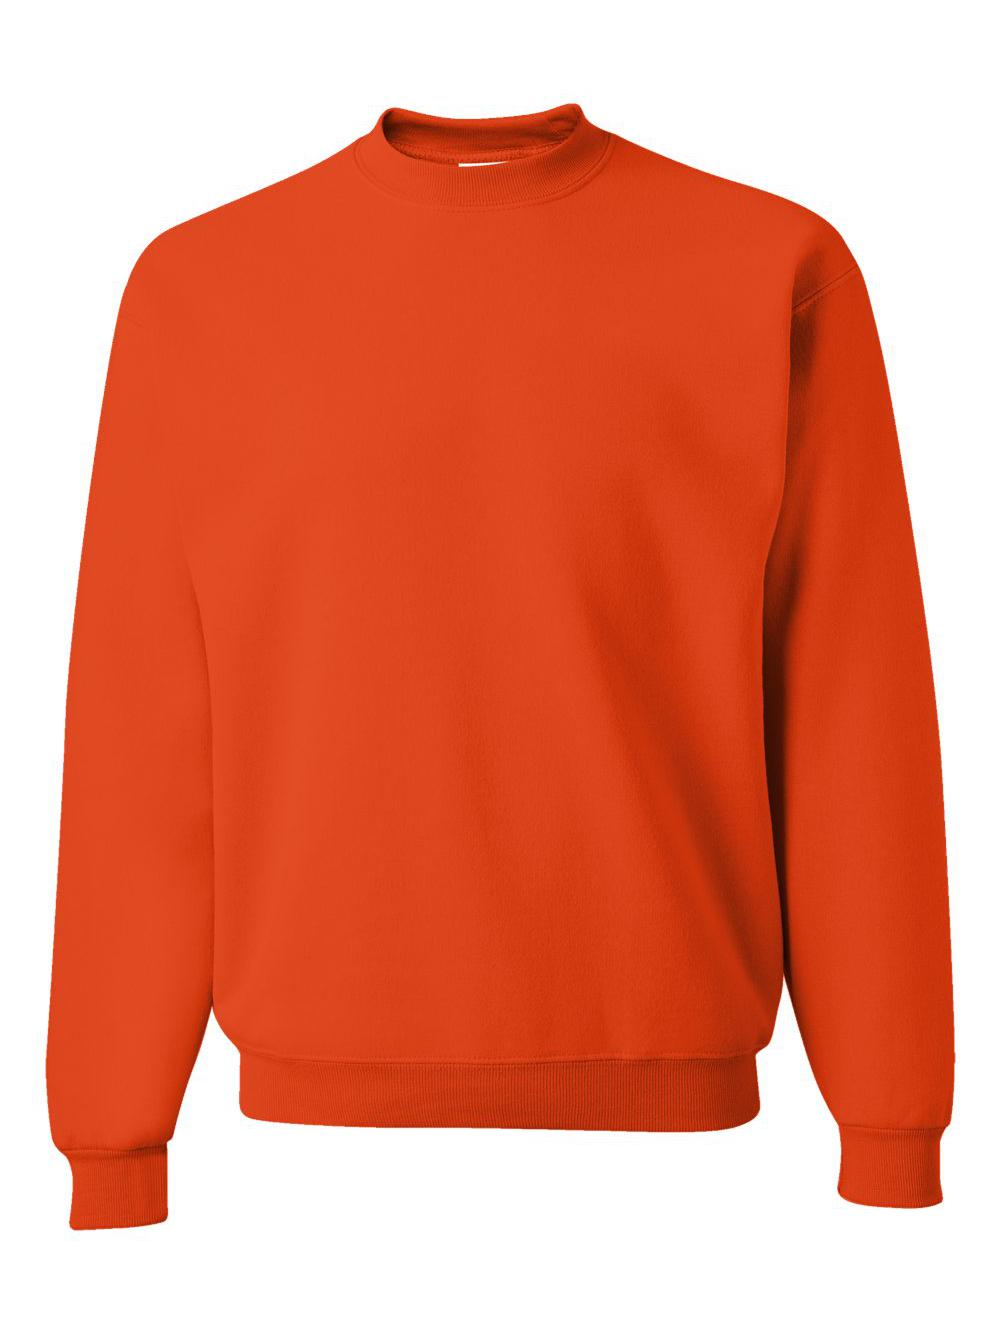 Jerzees-NuBlend-Crewneck-Sweatshirt-562MR thumbnail 15